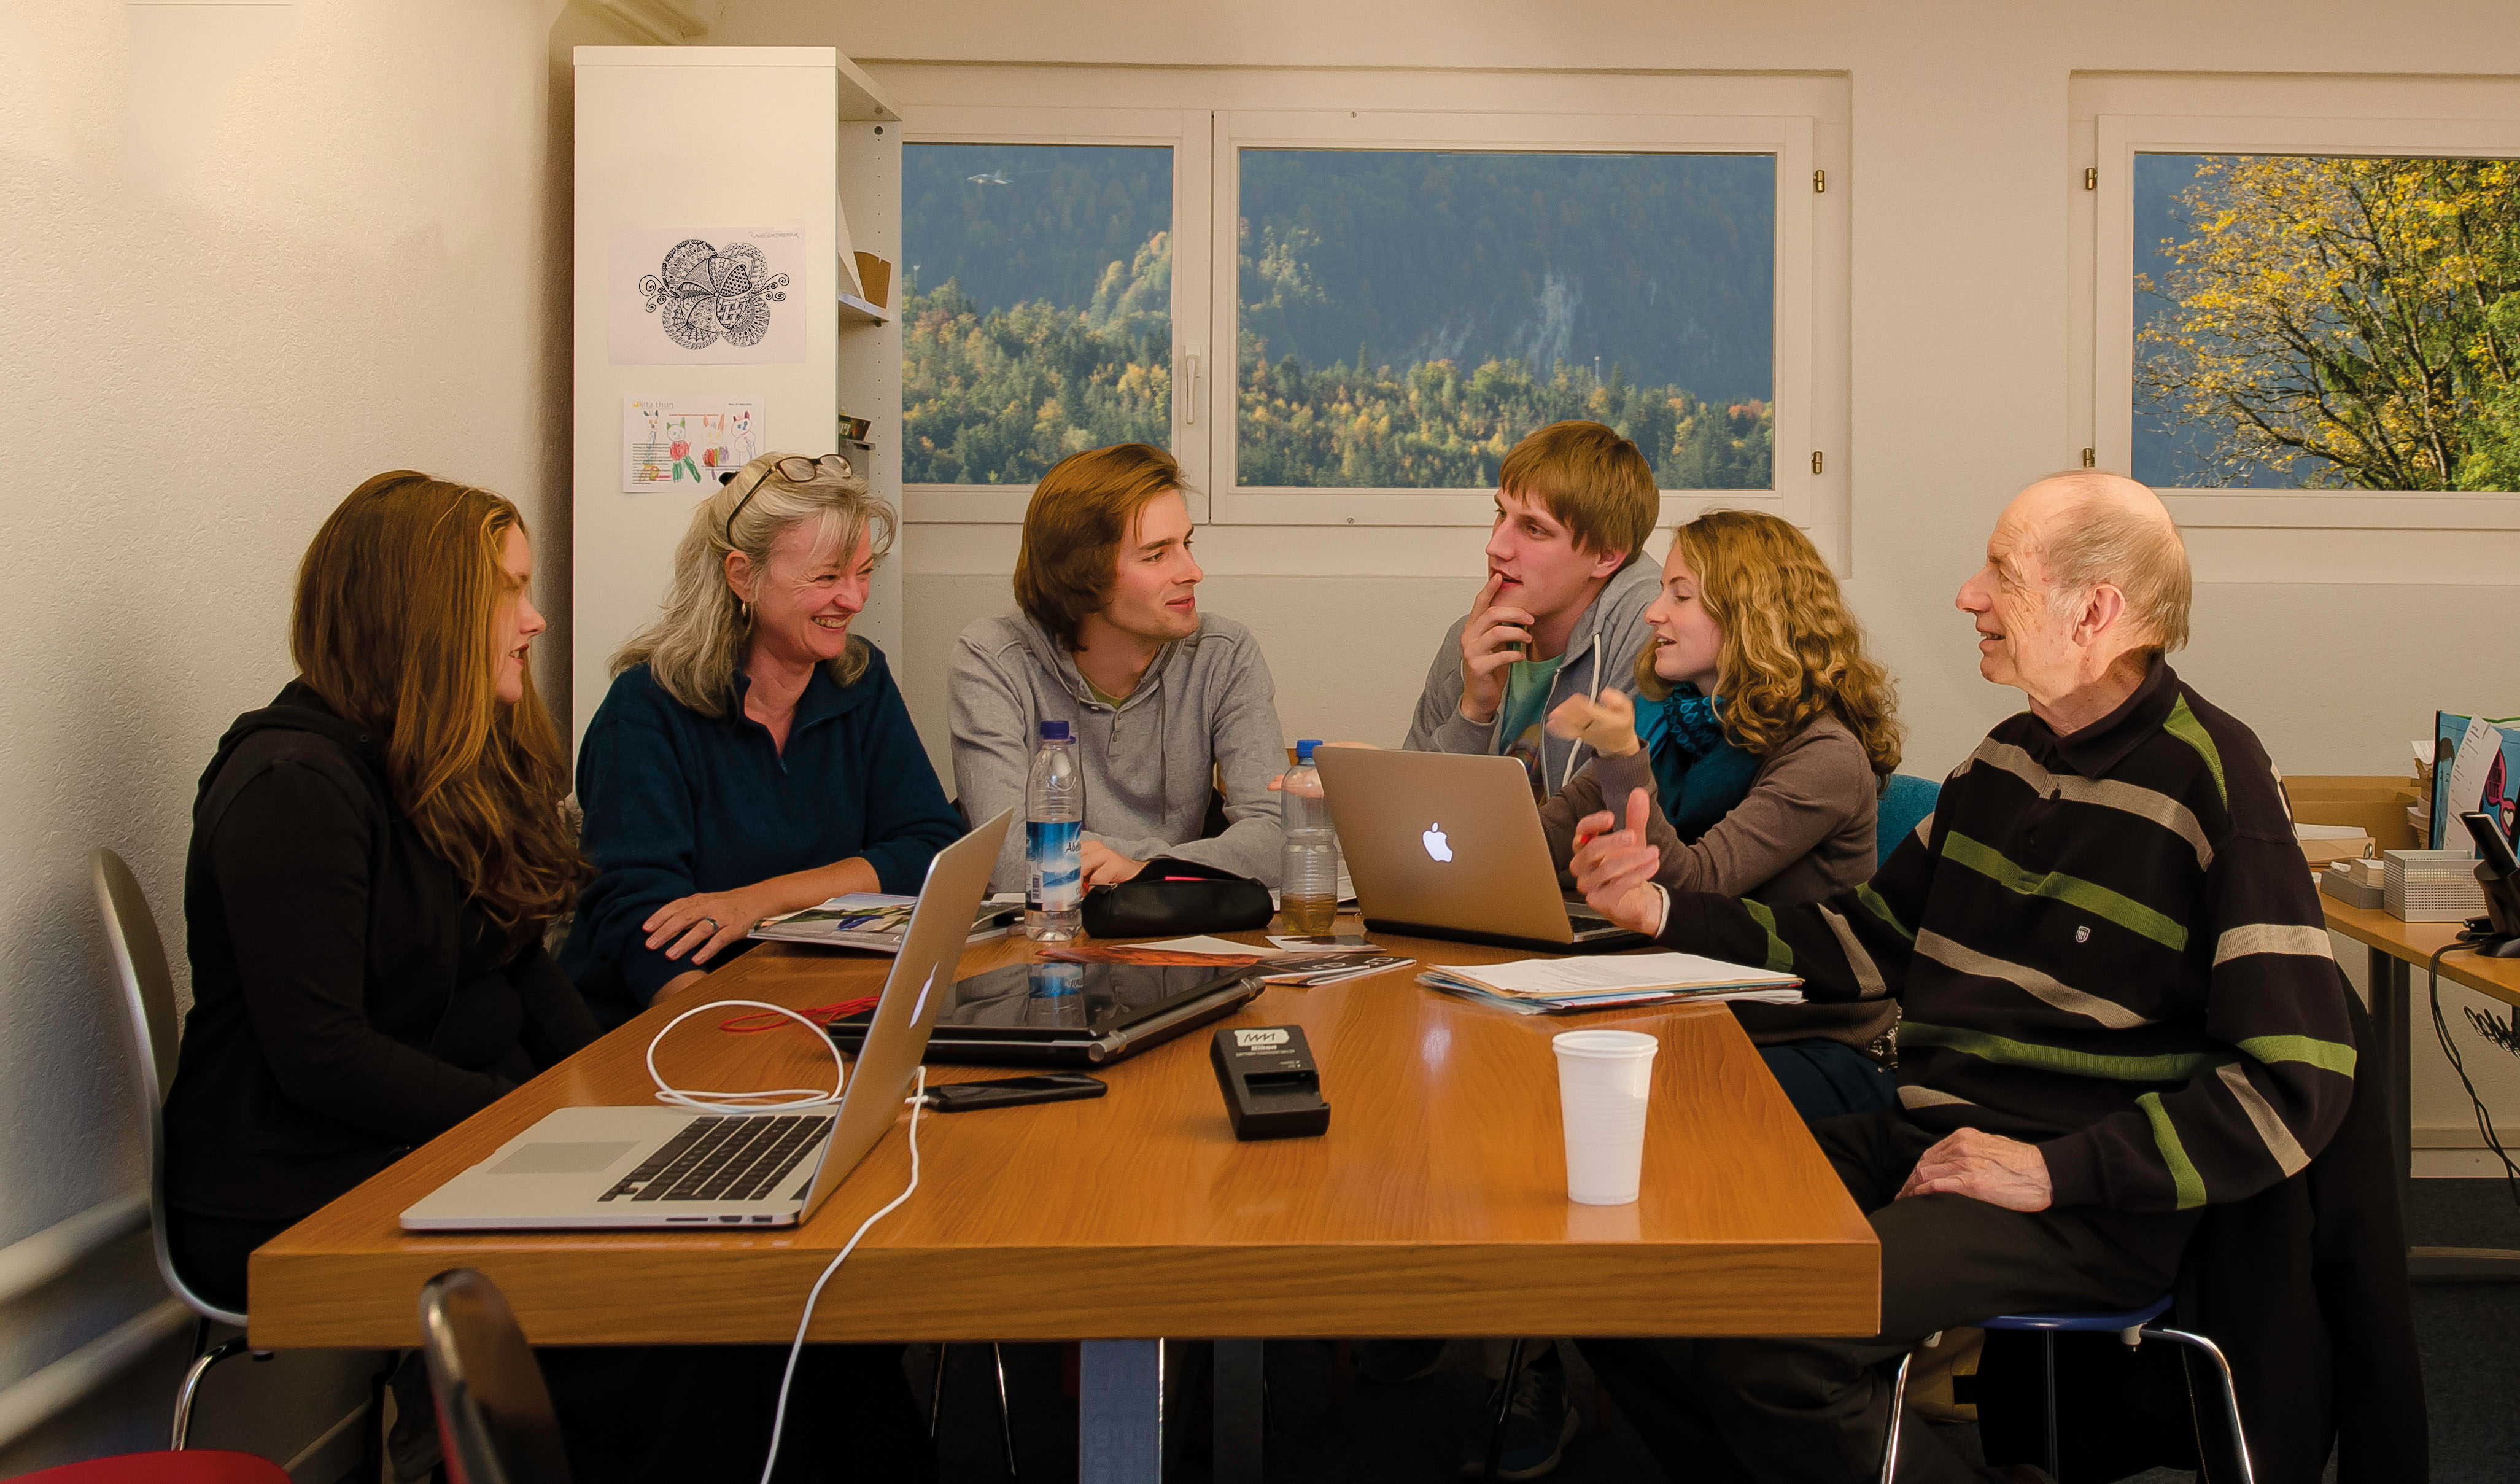 Die Kernredaktion Anfang 2015: Jana Daepp, Irène Sprenger, Elias Rüegsegger, Manuel Meister, Livia Thurian, Jürg Krebs. – Bild: mm/kr